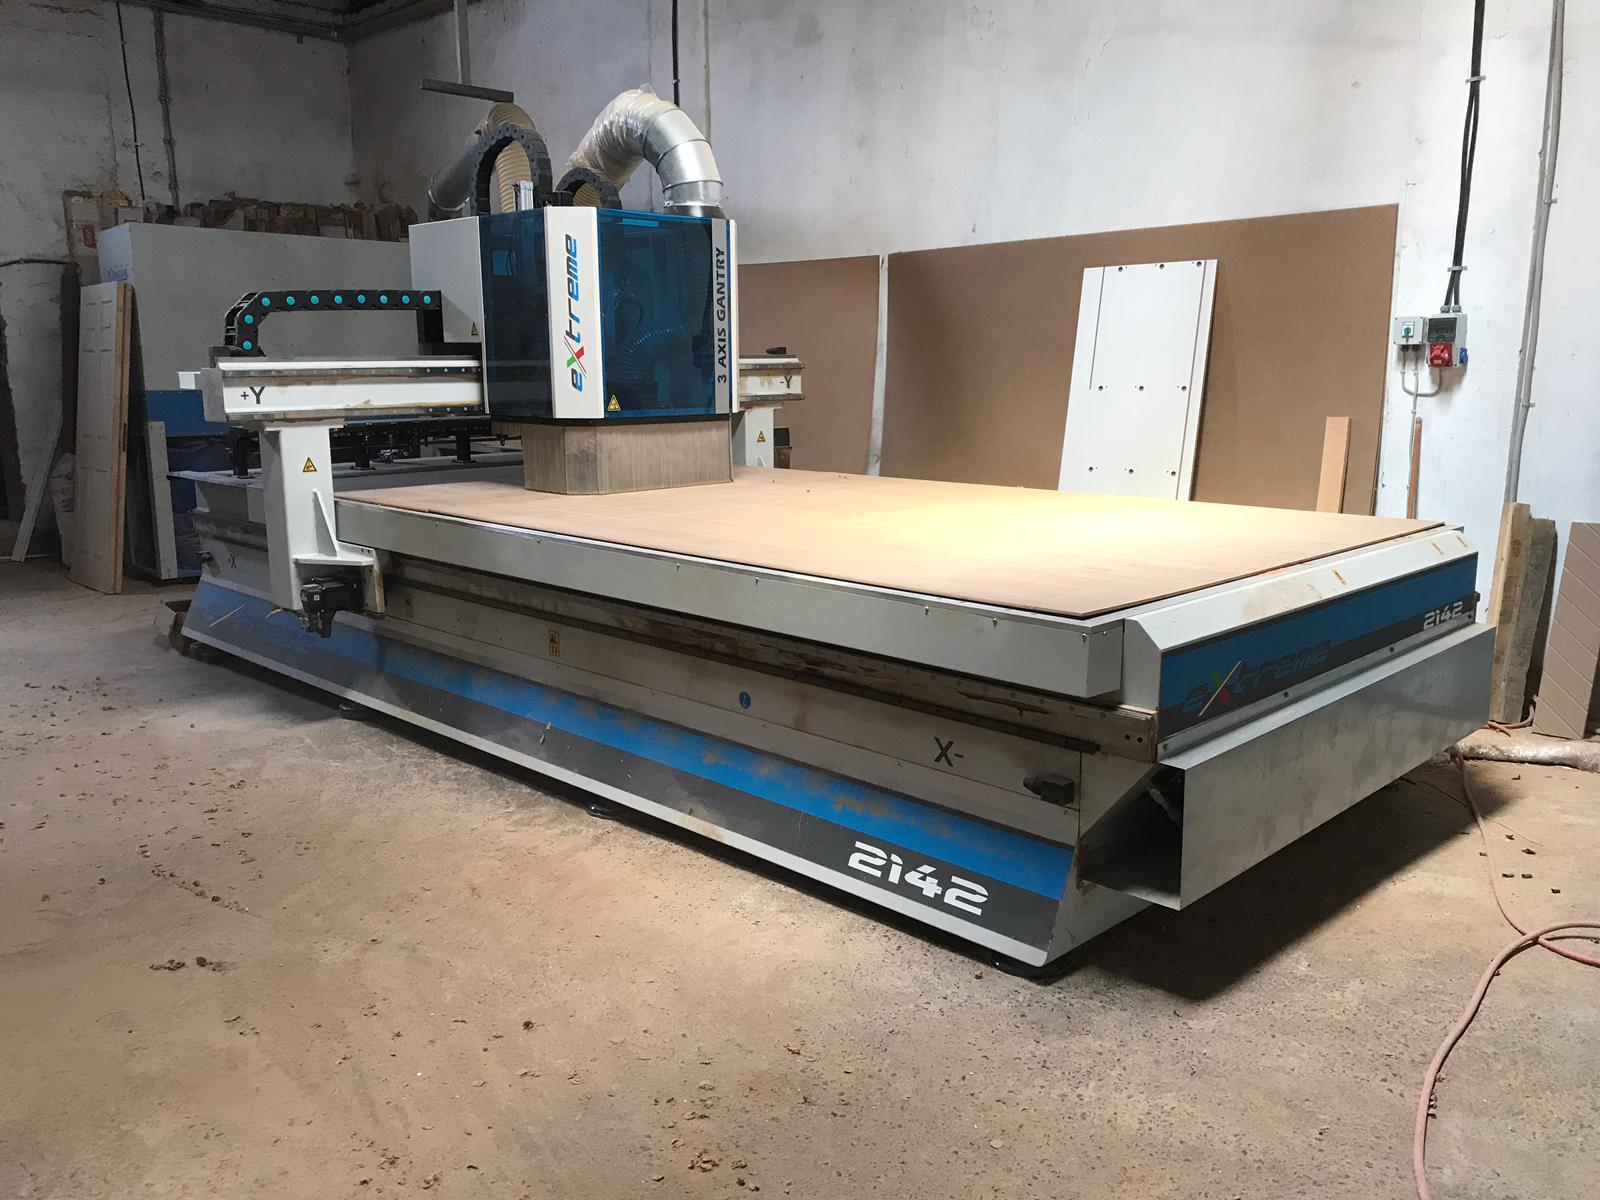 aes extreme 2142 wood cnc machining